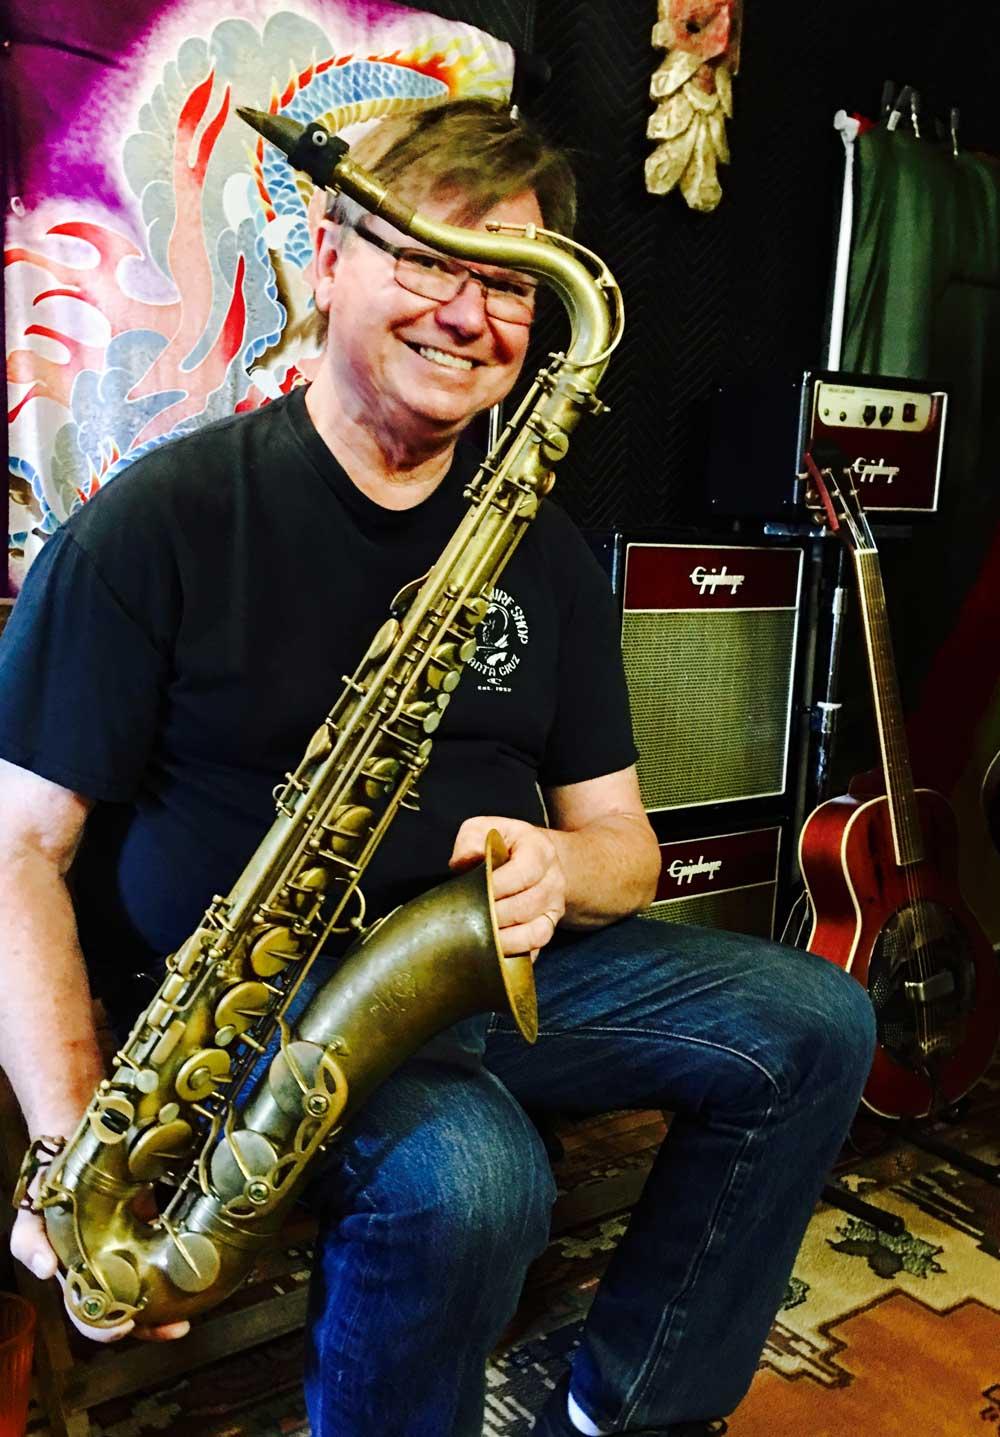 Jim Hannibal, saxaphone